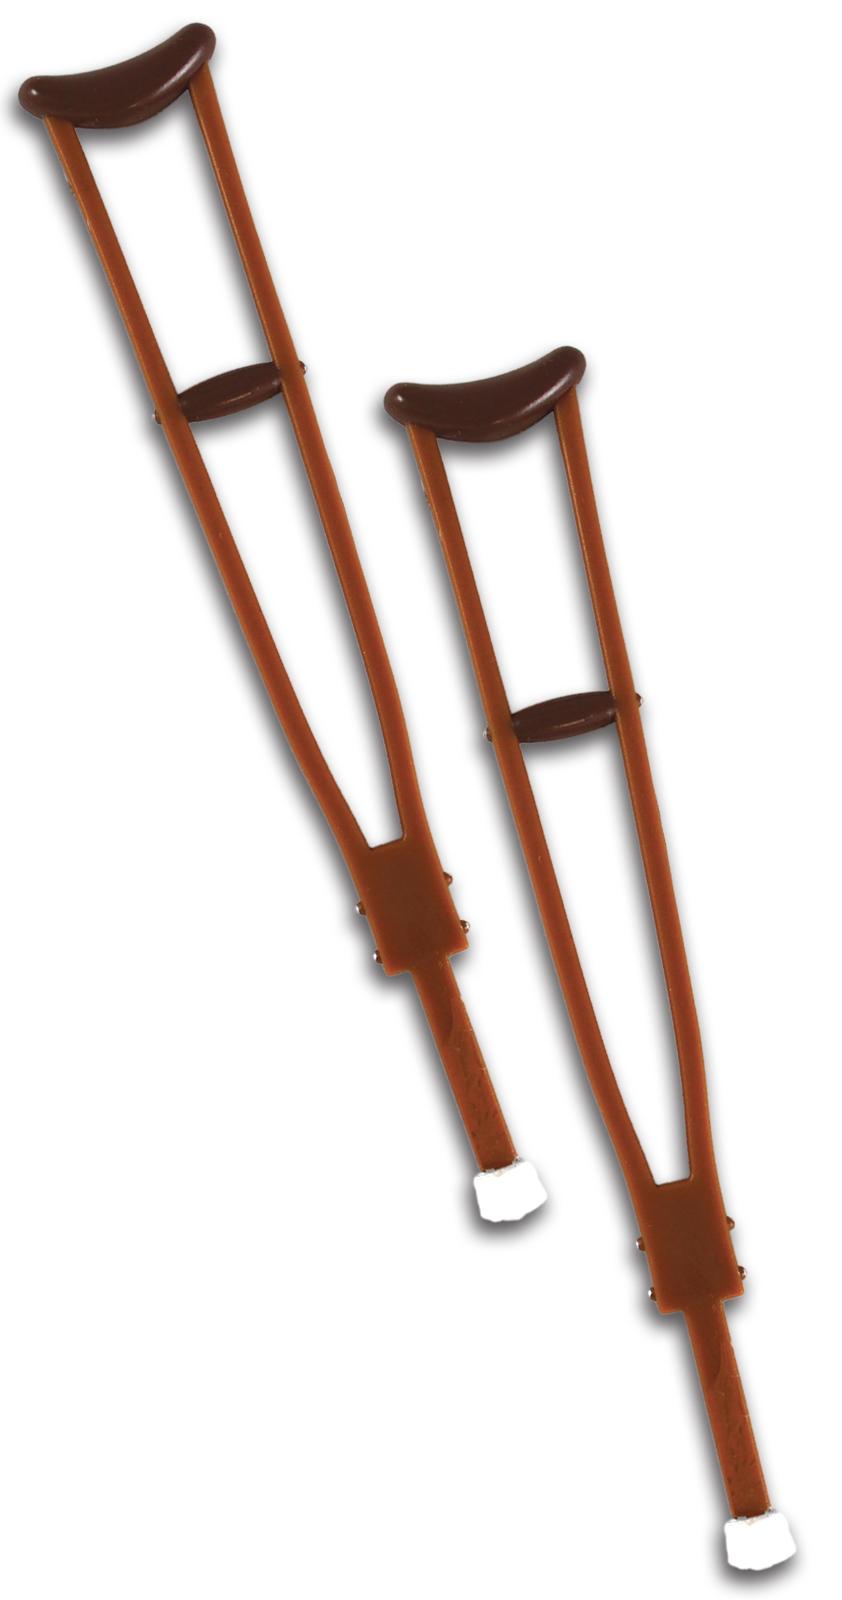 WWE Pair of Crutches (Wooden) -  Ringside Exclusive Toy Wrestling Action Figure Accessories PartNumber: 004V008686775000P KsnValue: 004V008686775000 MfgPartNumber: REX-063